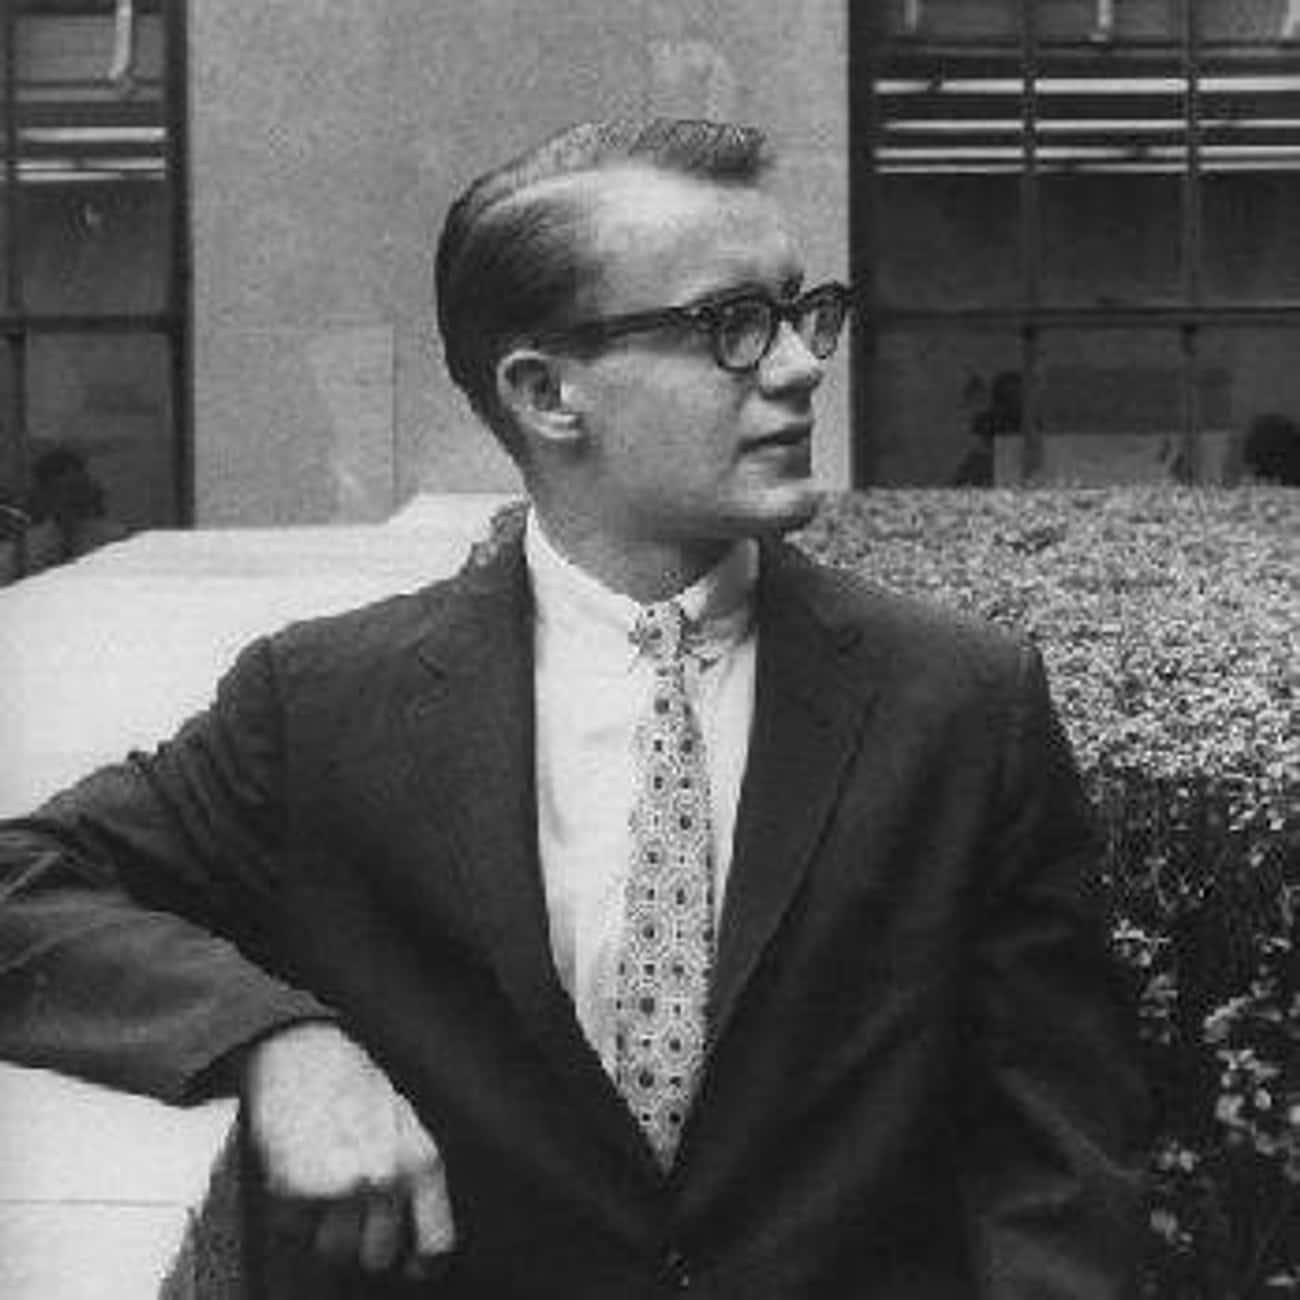 Michael Rockefeller Disappeared In 1961